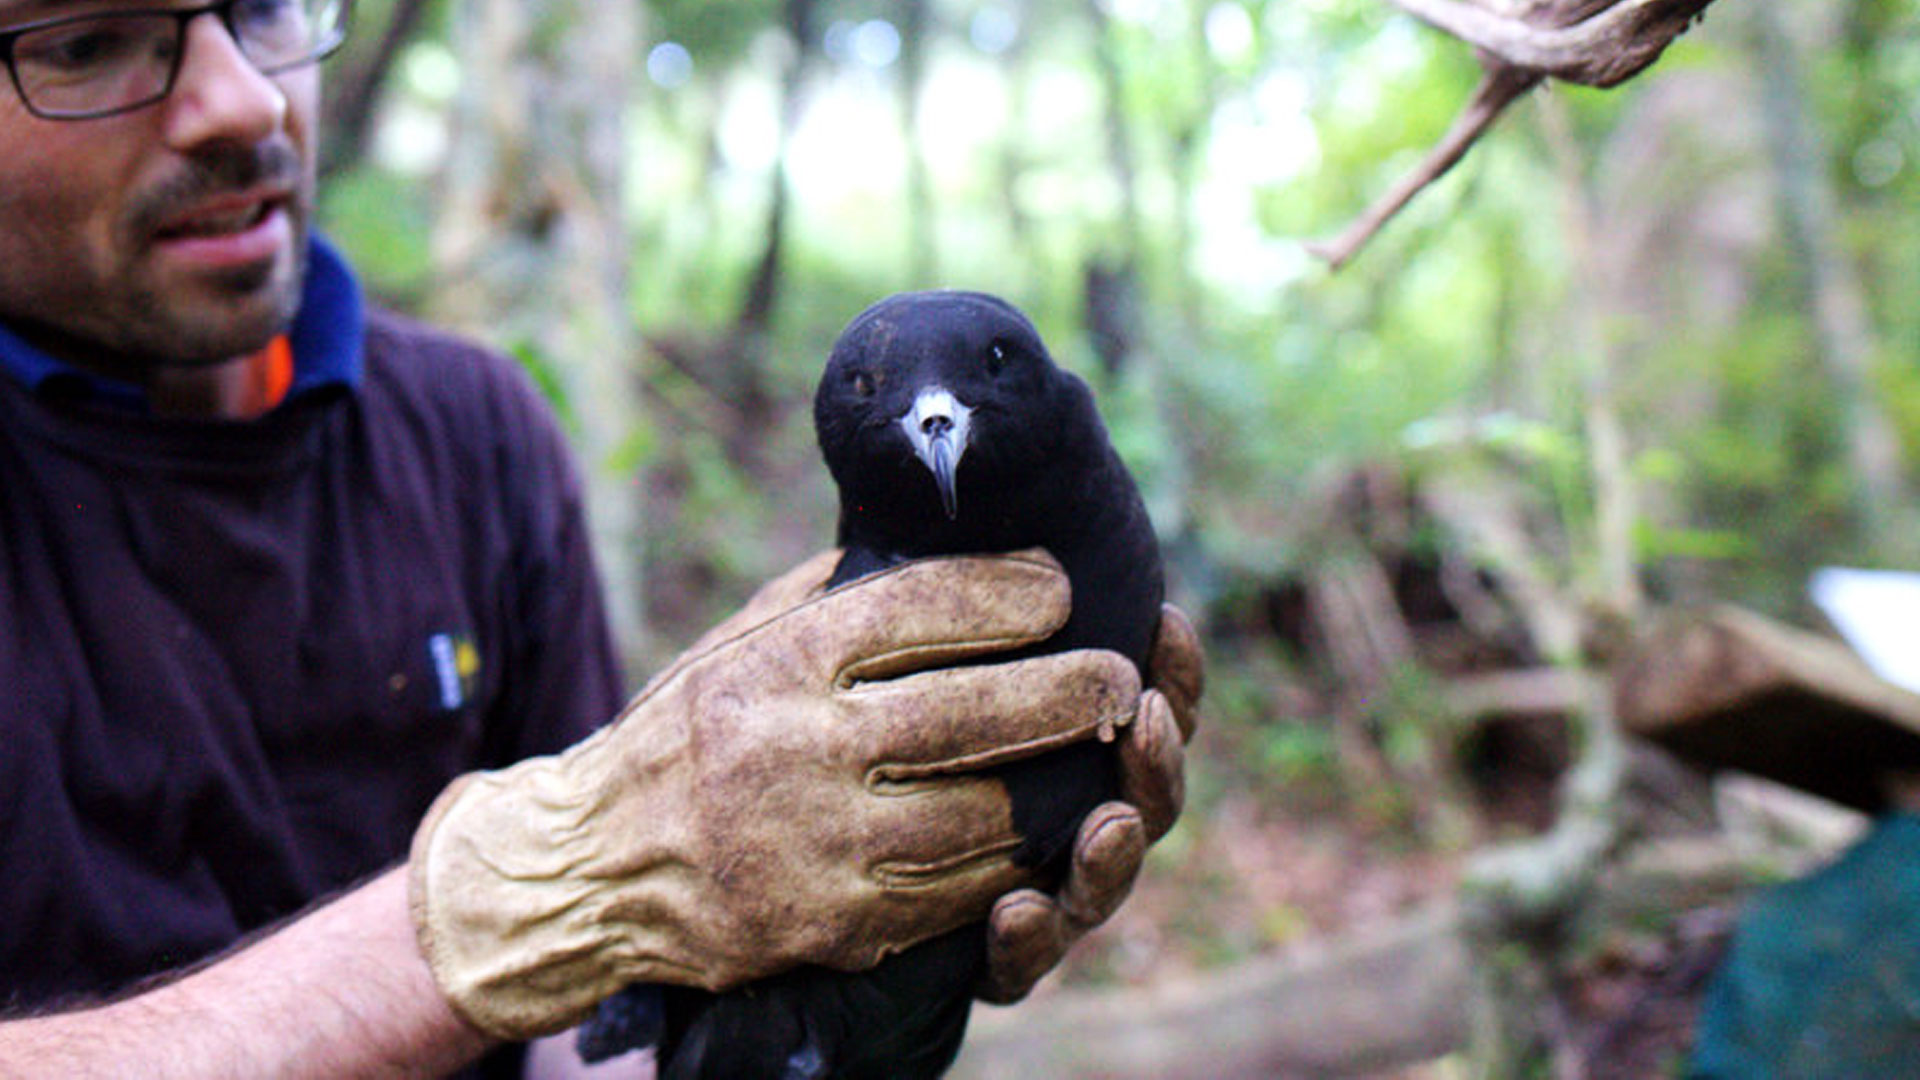 https://rfacdn.nz/zoo/assets/media/conserving-native-seabirds-gallery-2.jpg